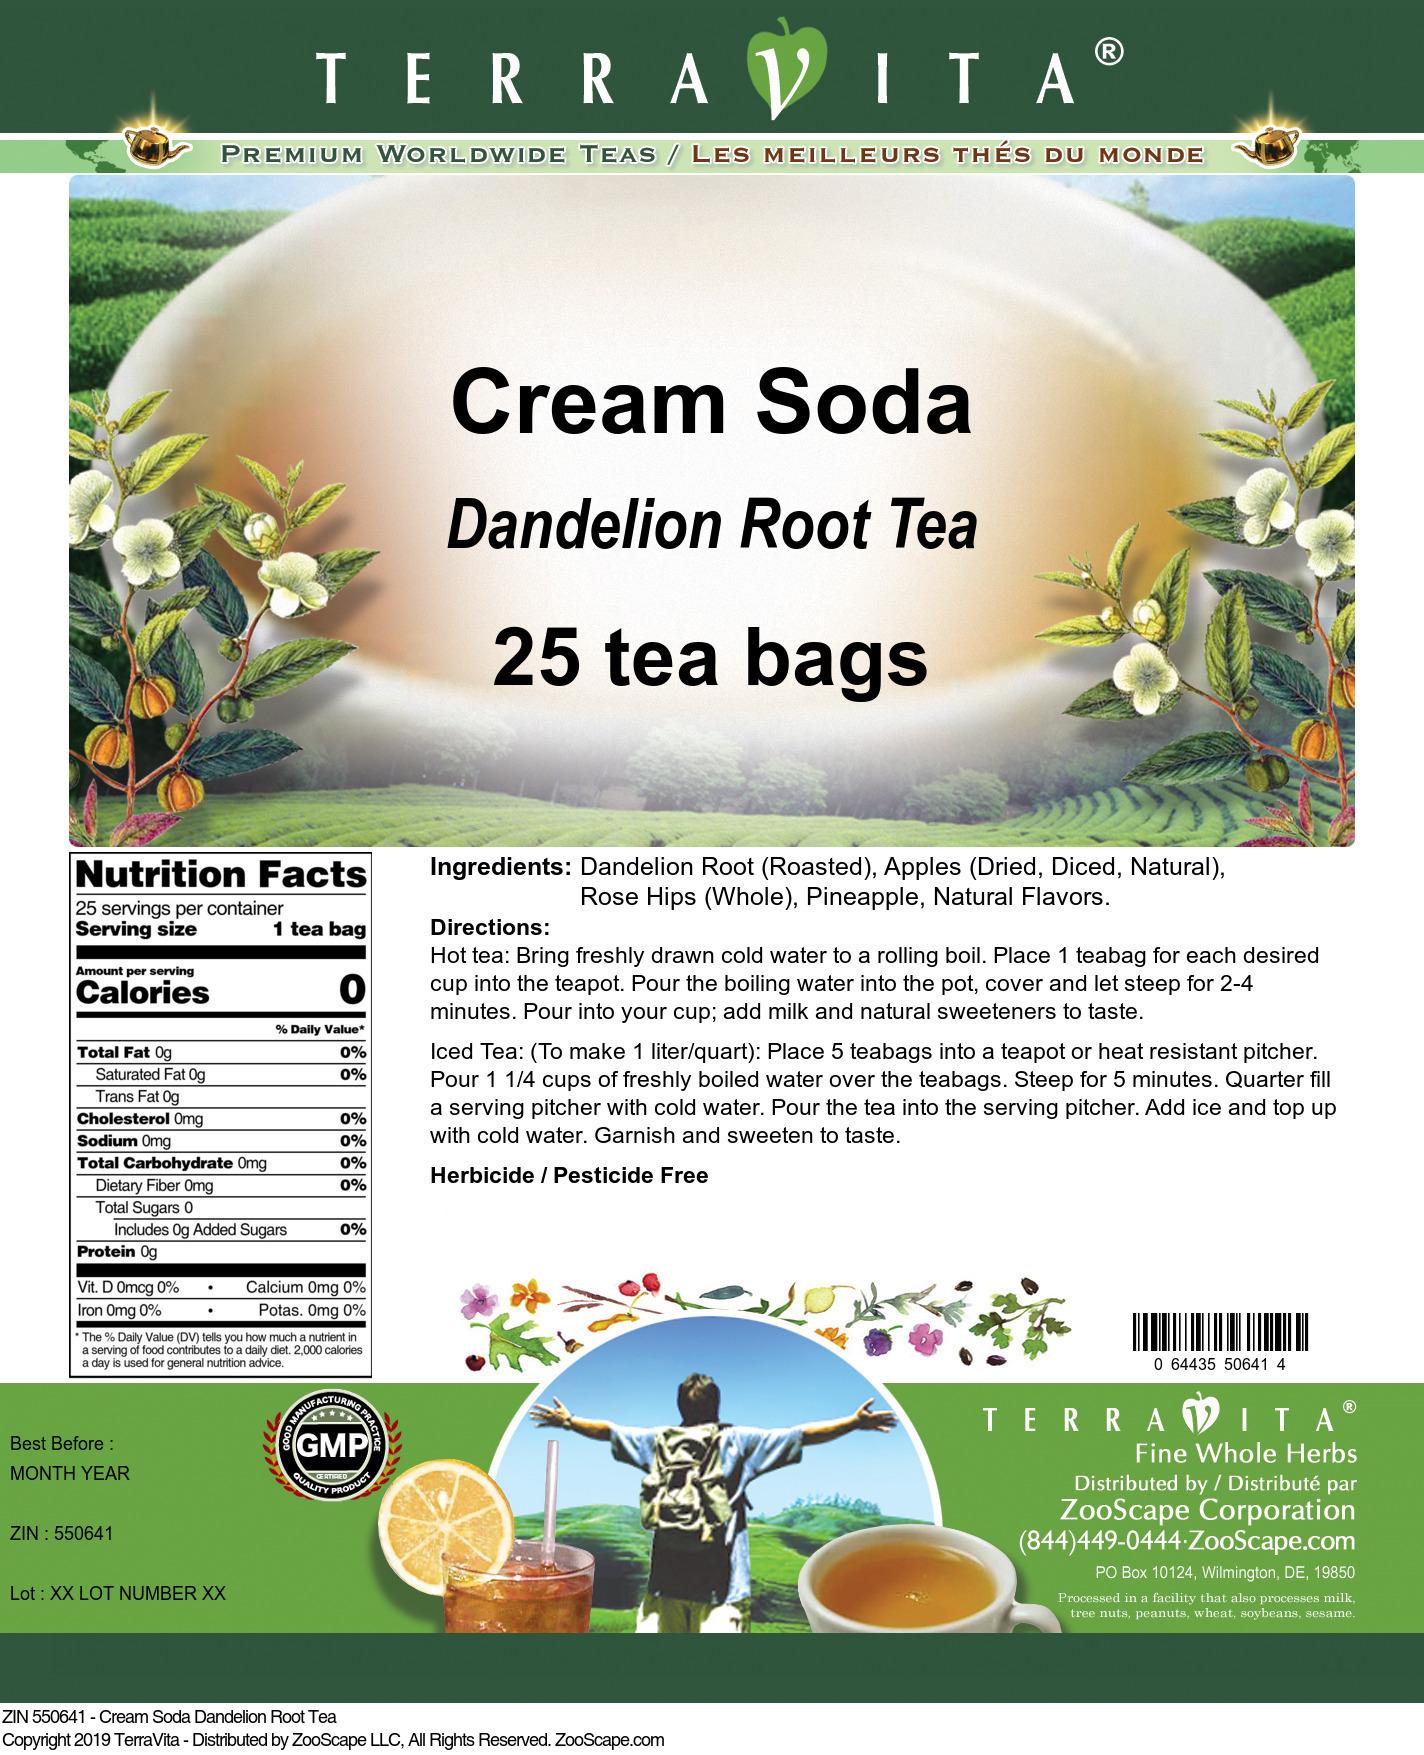 Cream Soda Dandelion Root Tea